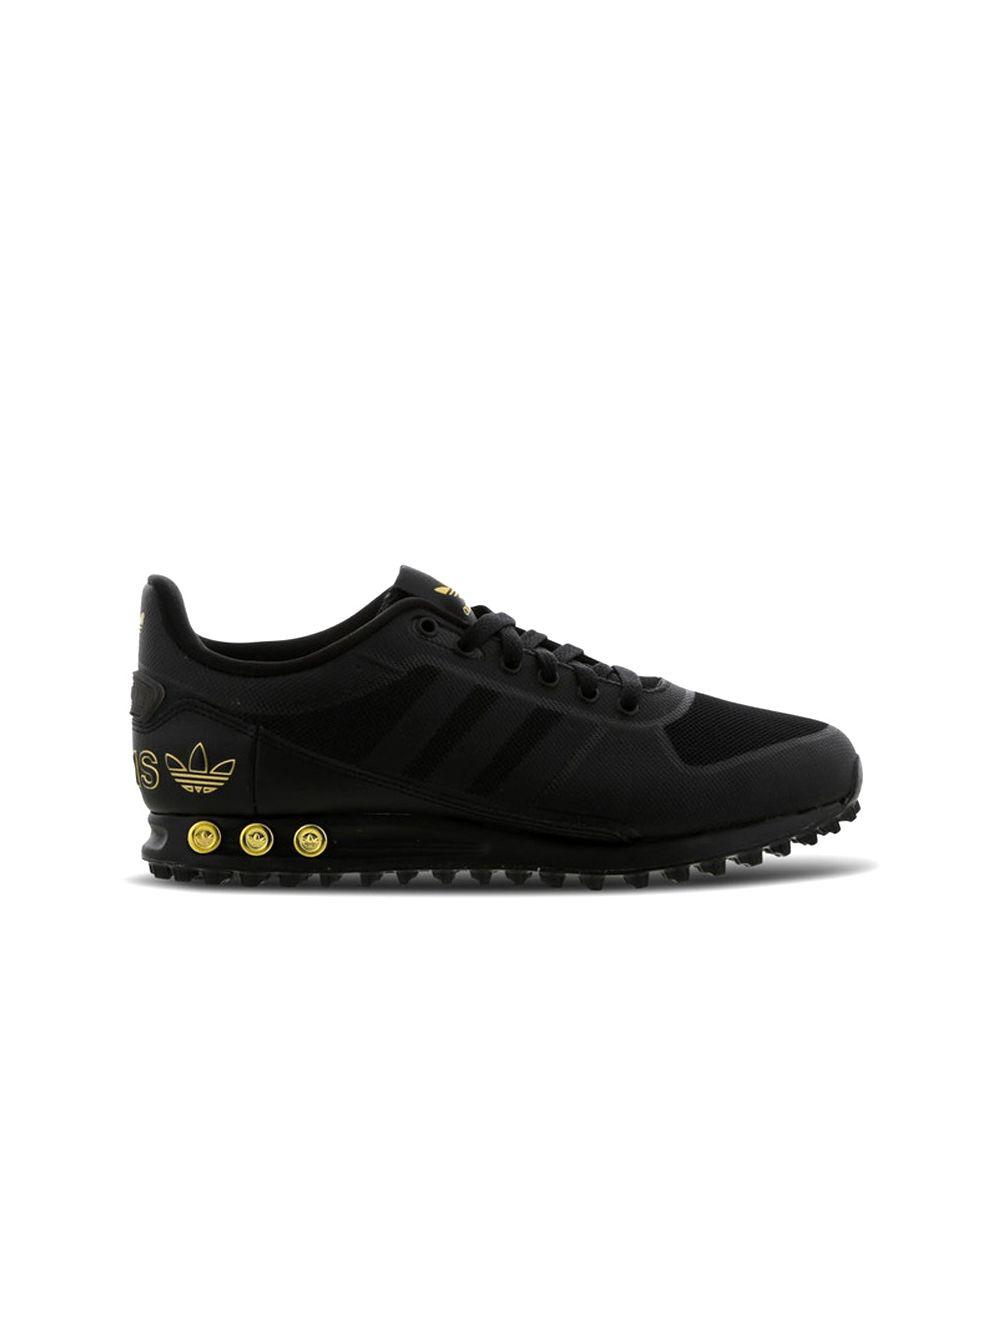 adidas Originals LA Trainer 2 Sneaker Mens Black